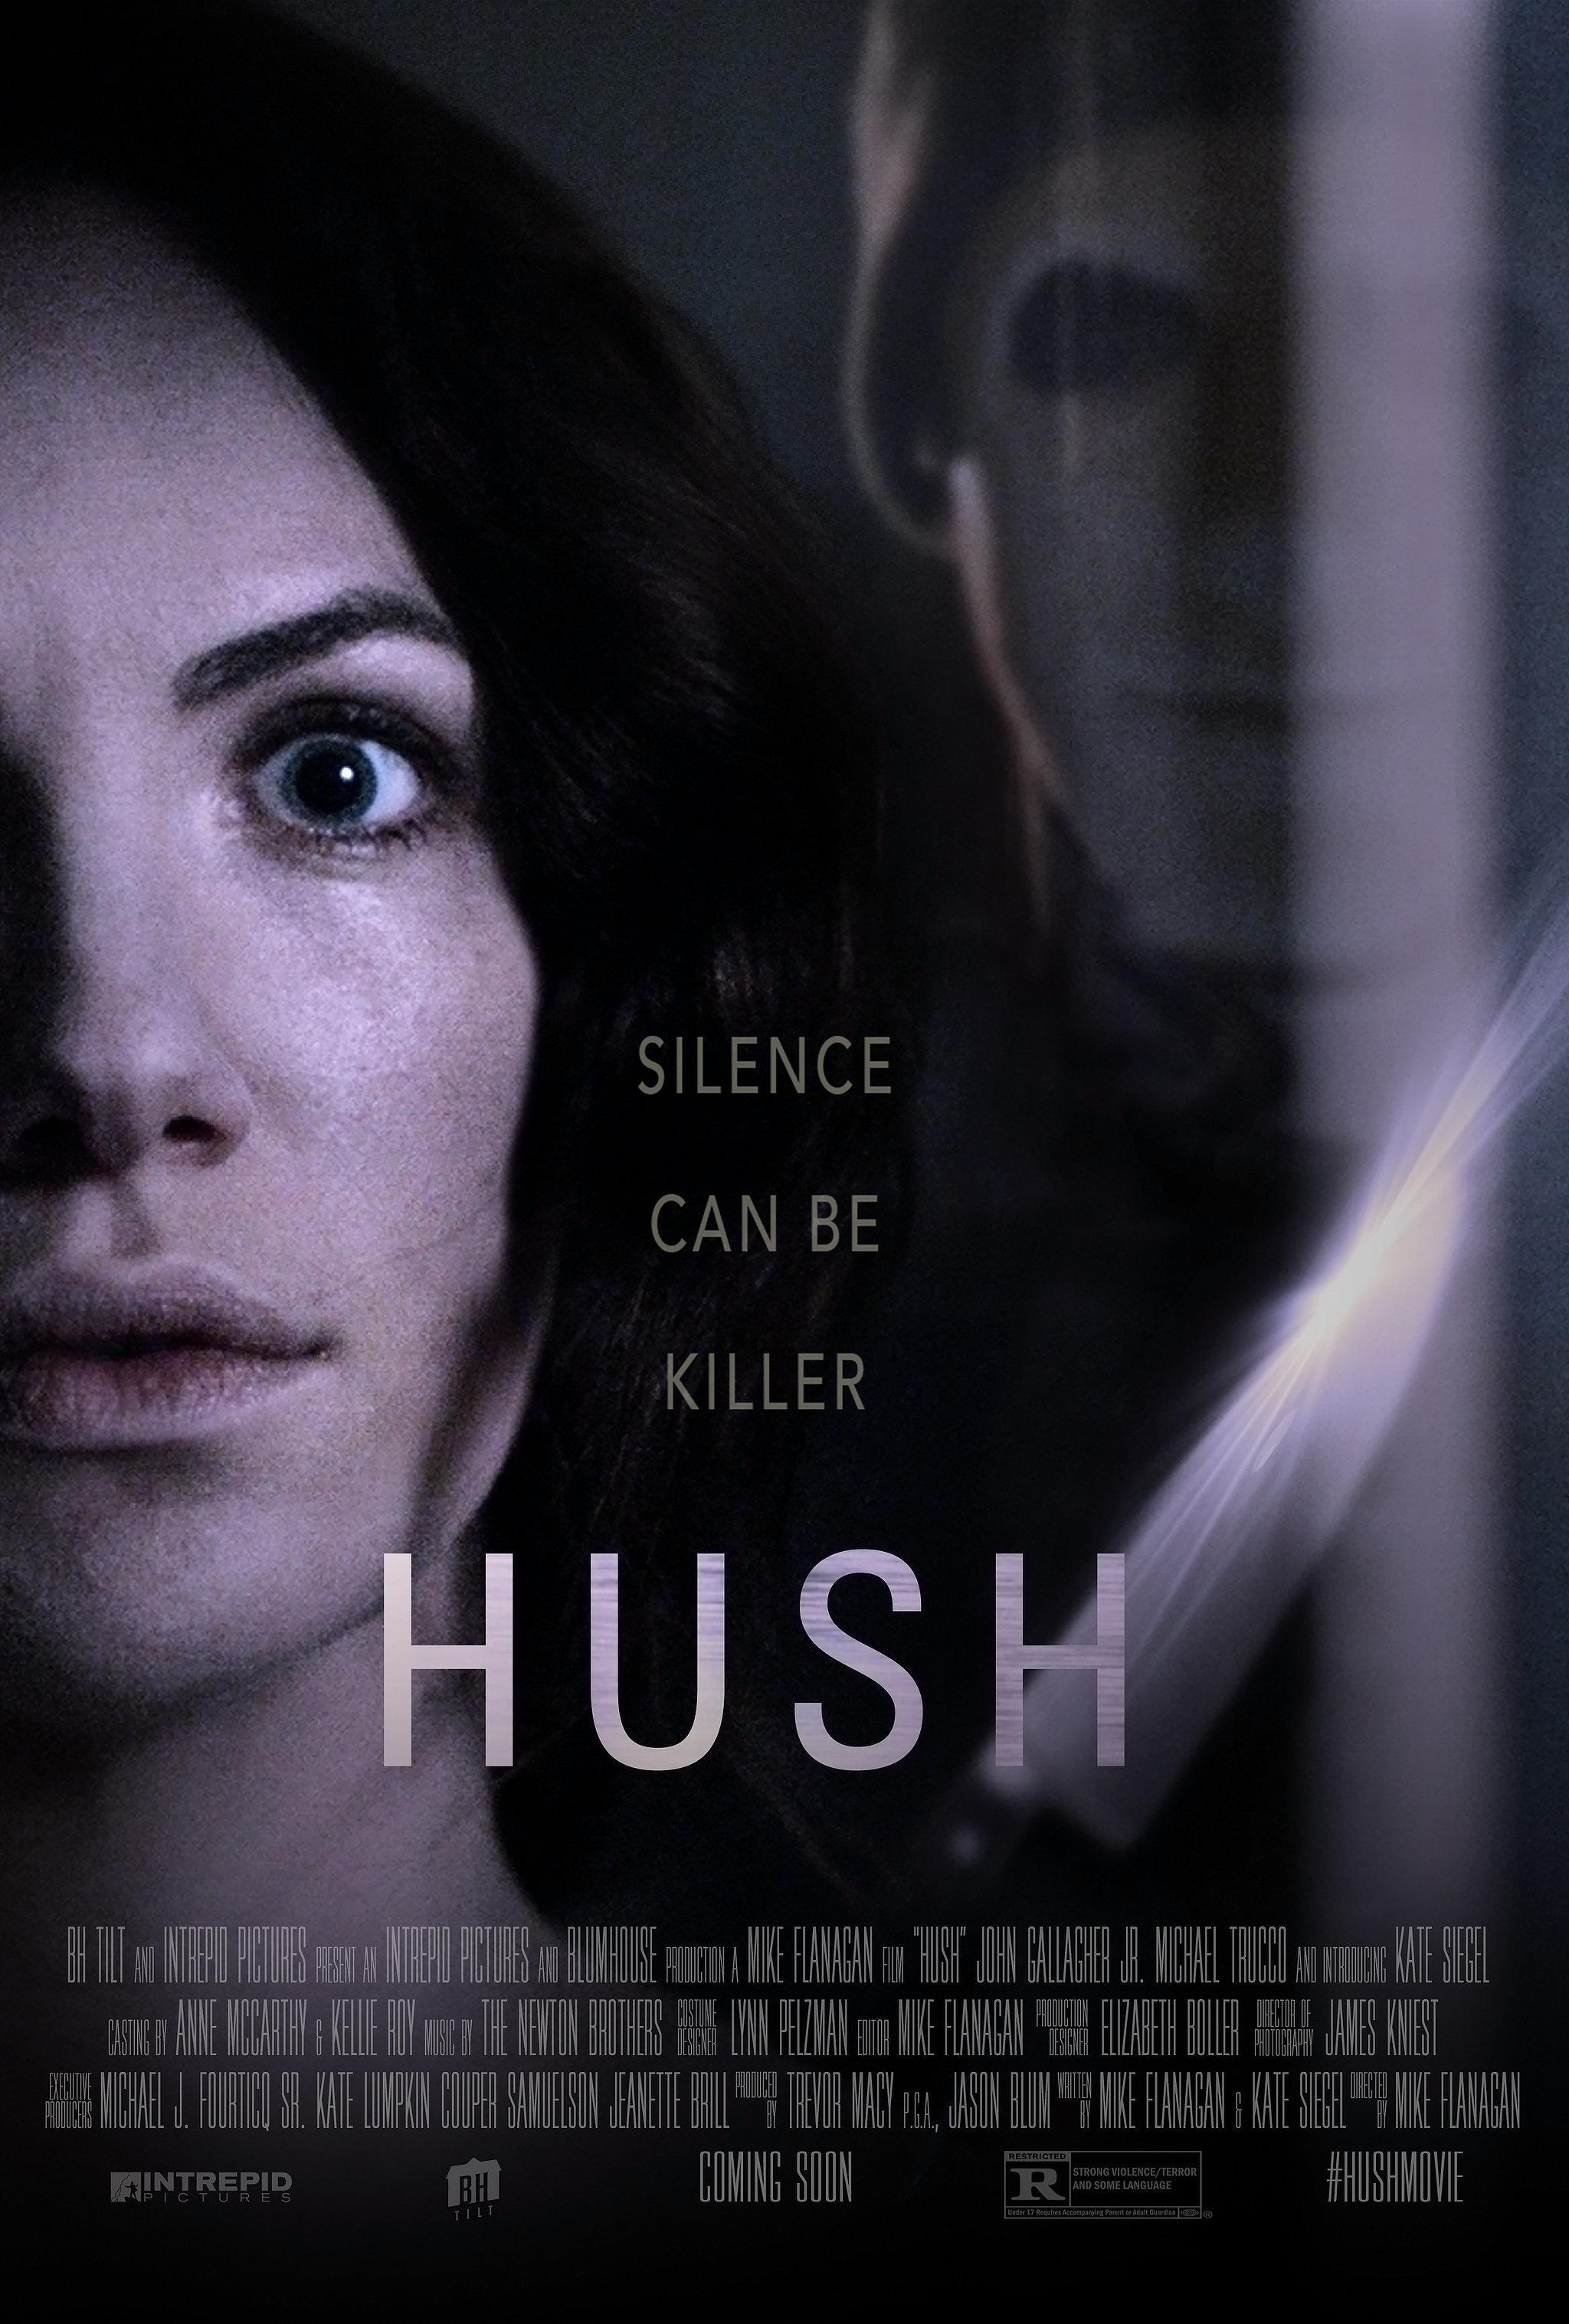 HUSH Movie review